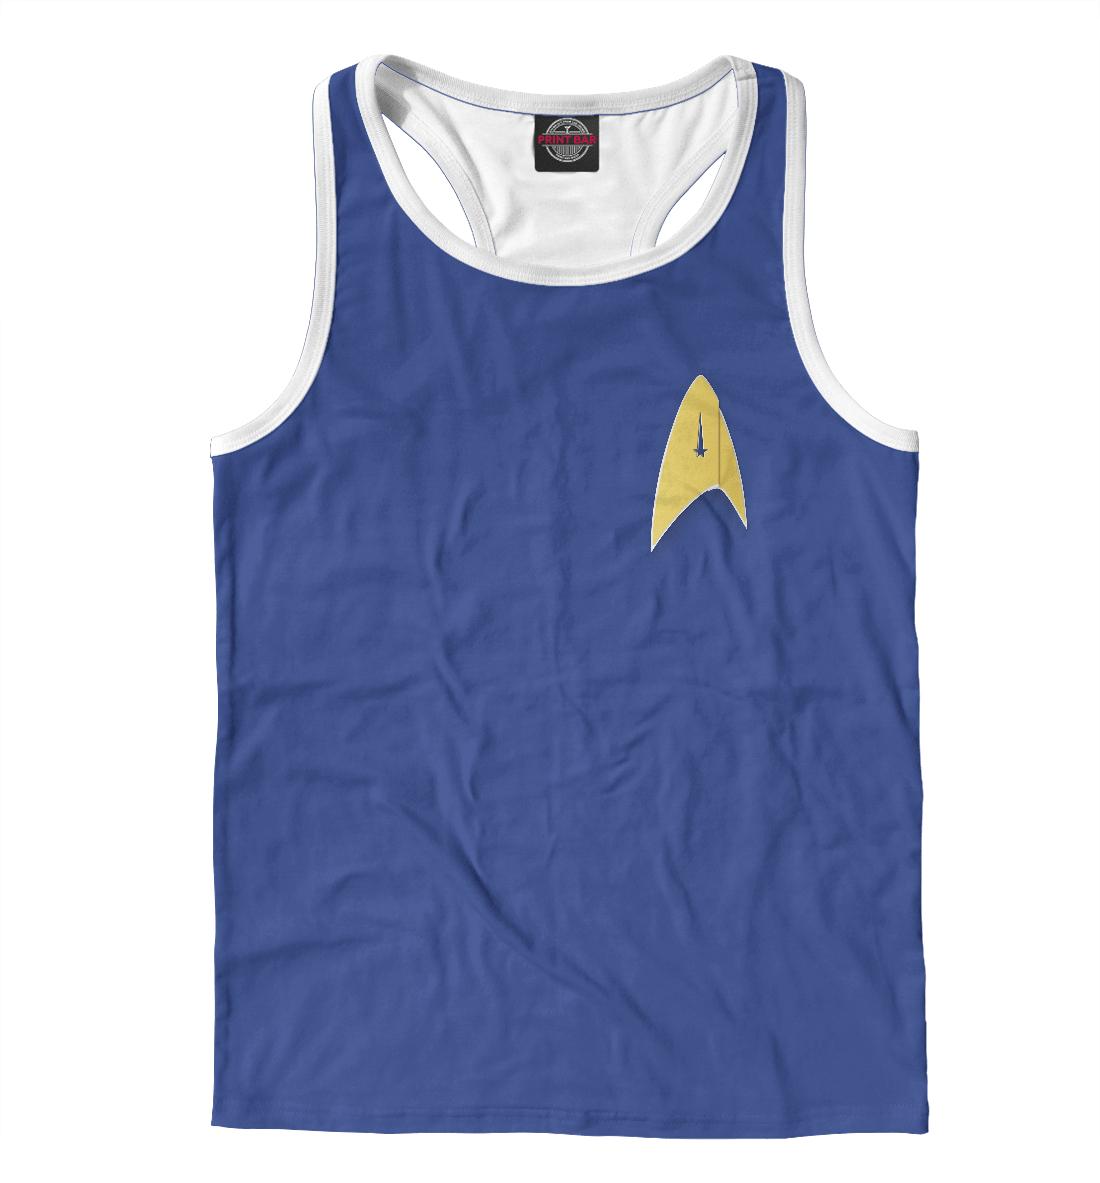 Купить Звёздный путь: Дискавери, Printbar, Майки борцовки, SDC-410052-mayb-2